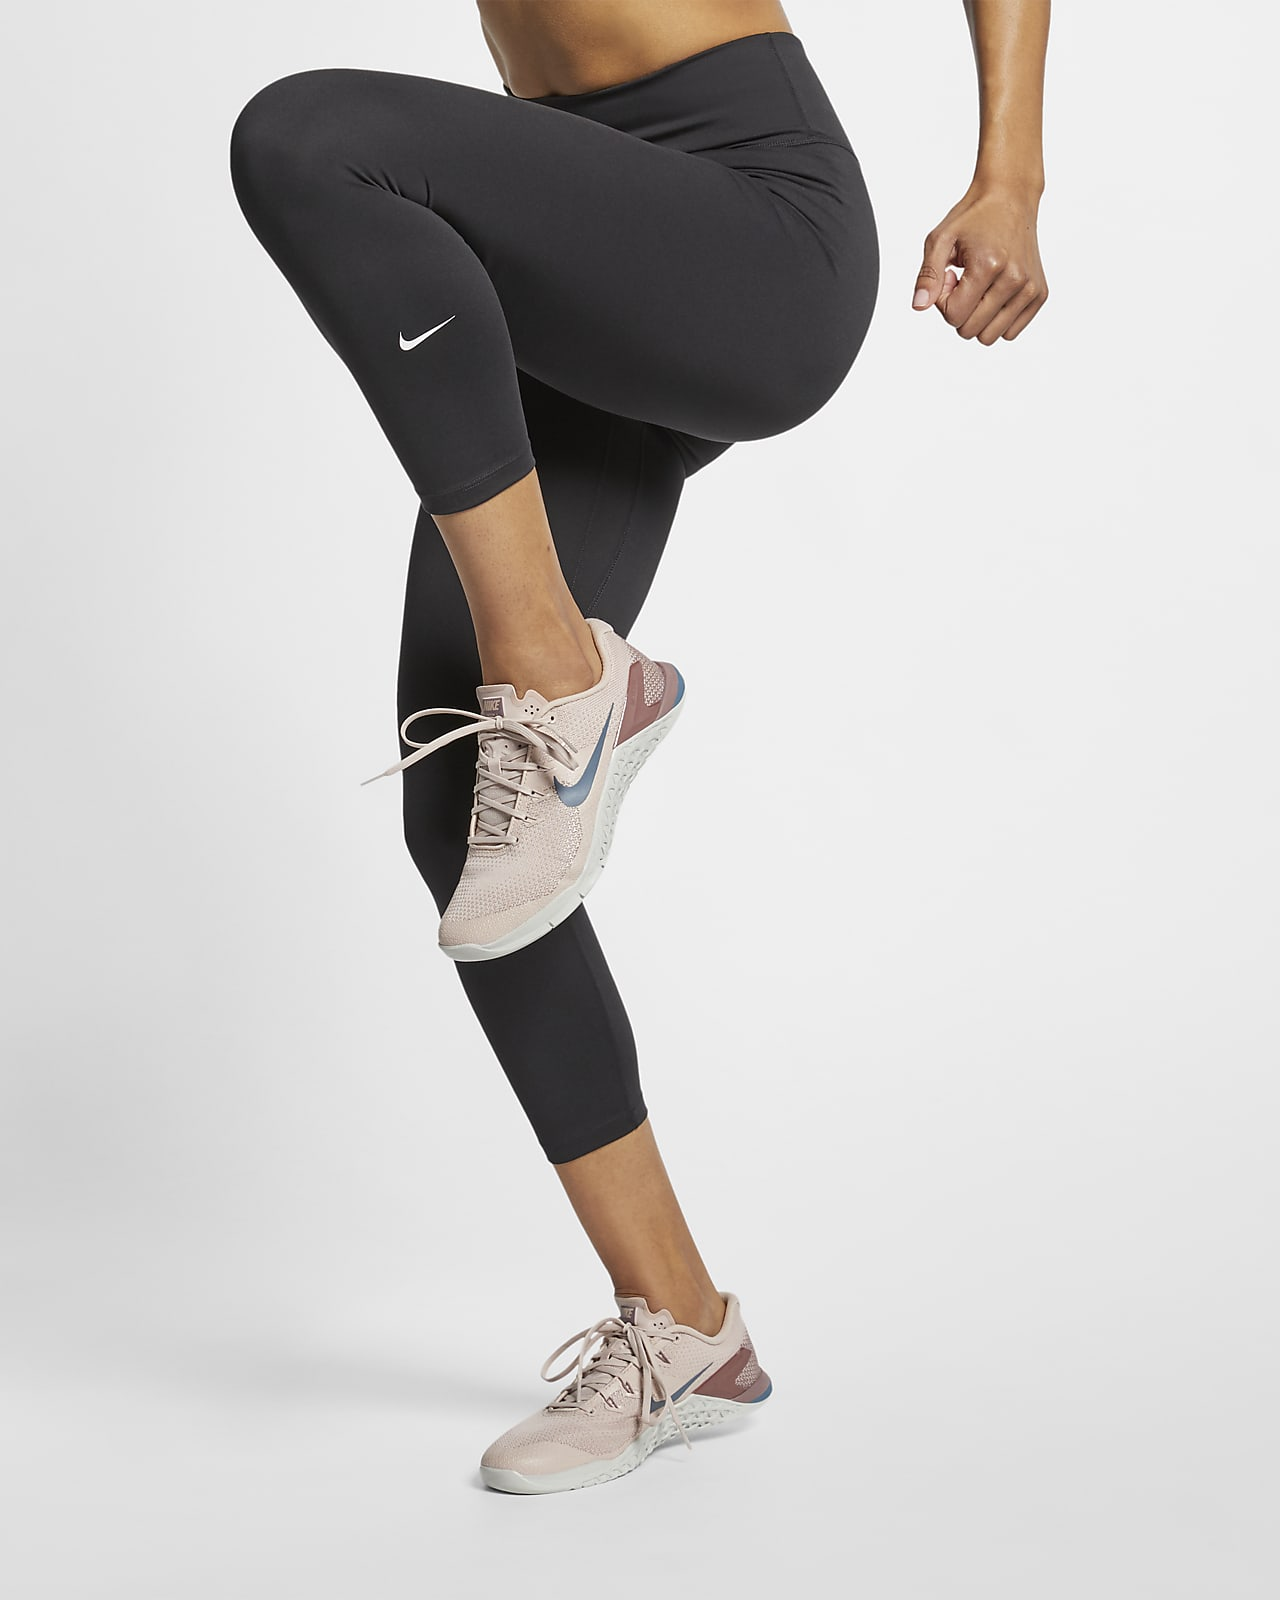 Nike One kort tights med mellomhøyt liv til dame